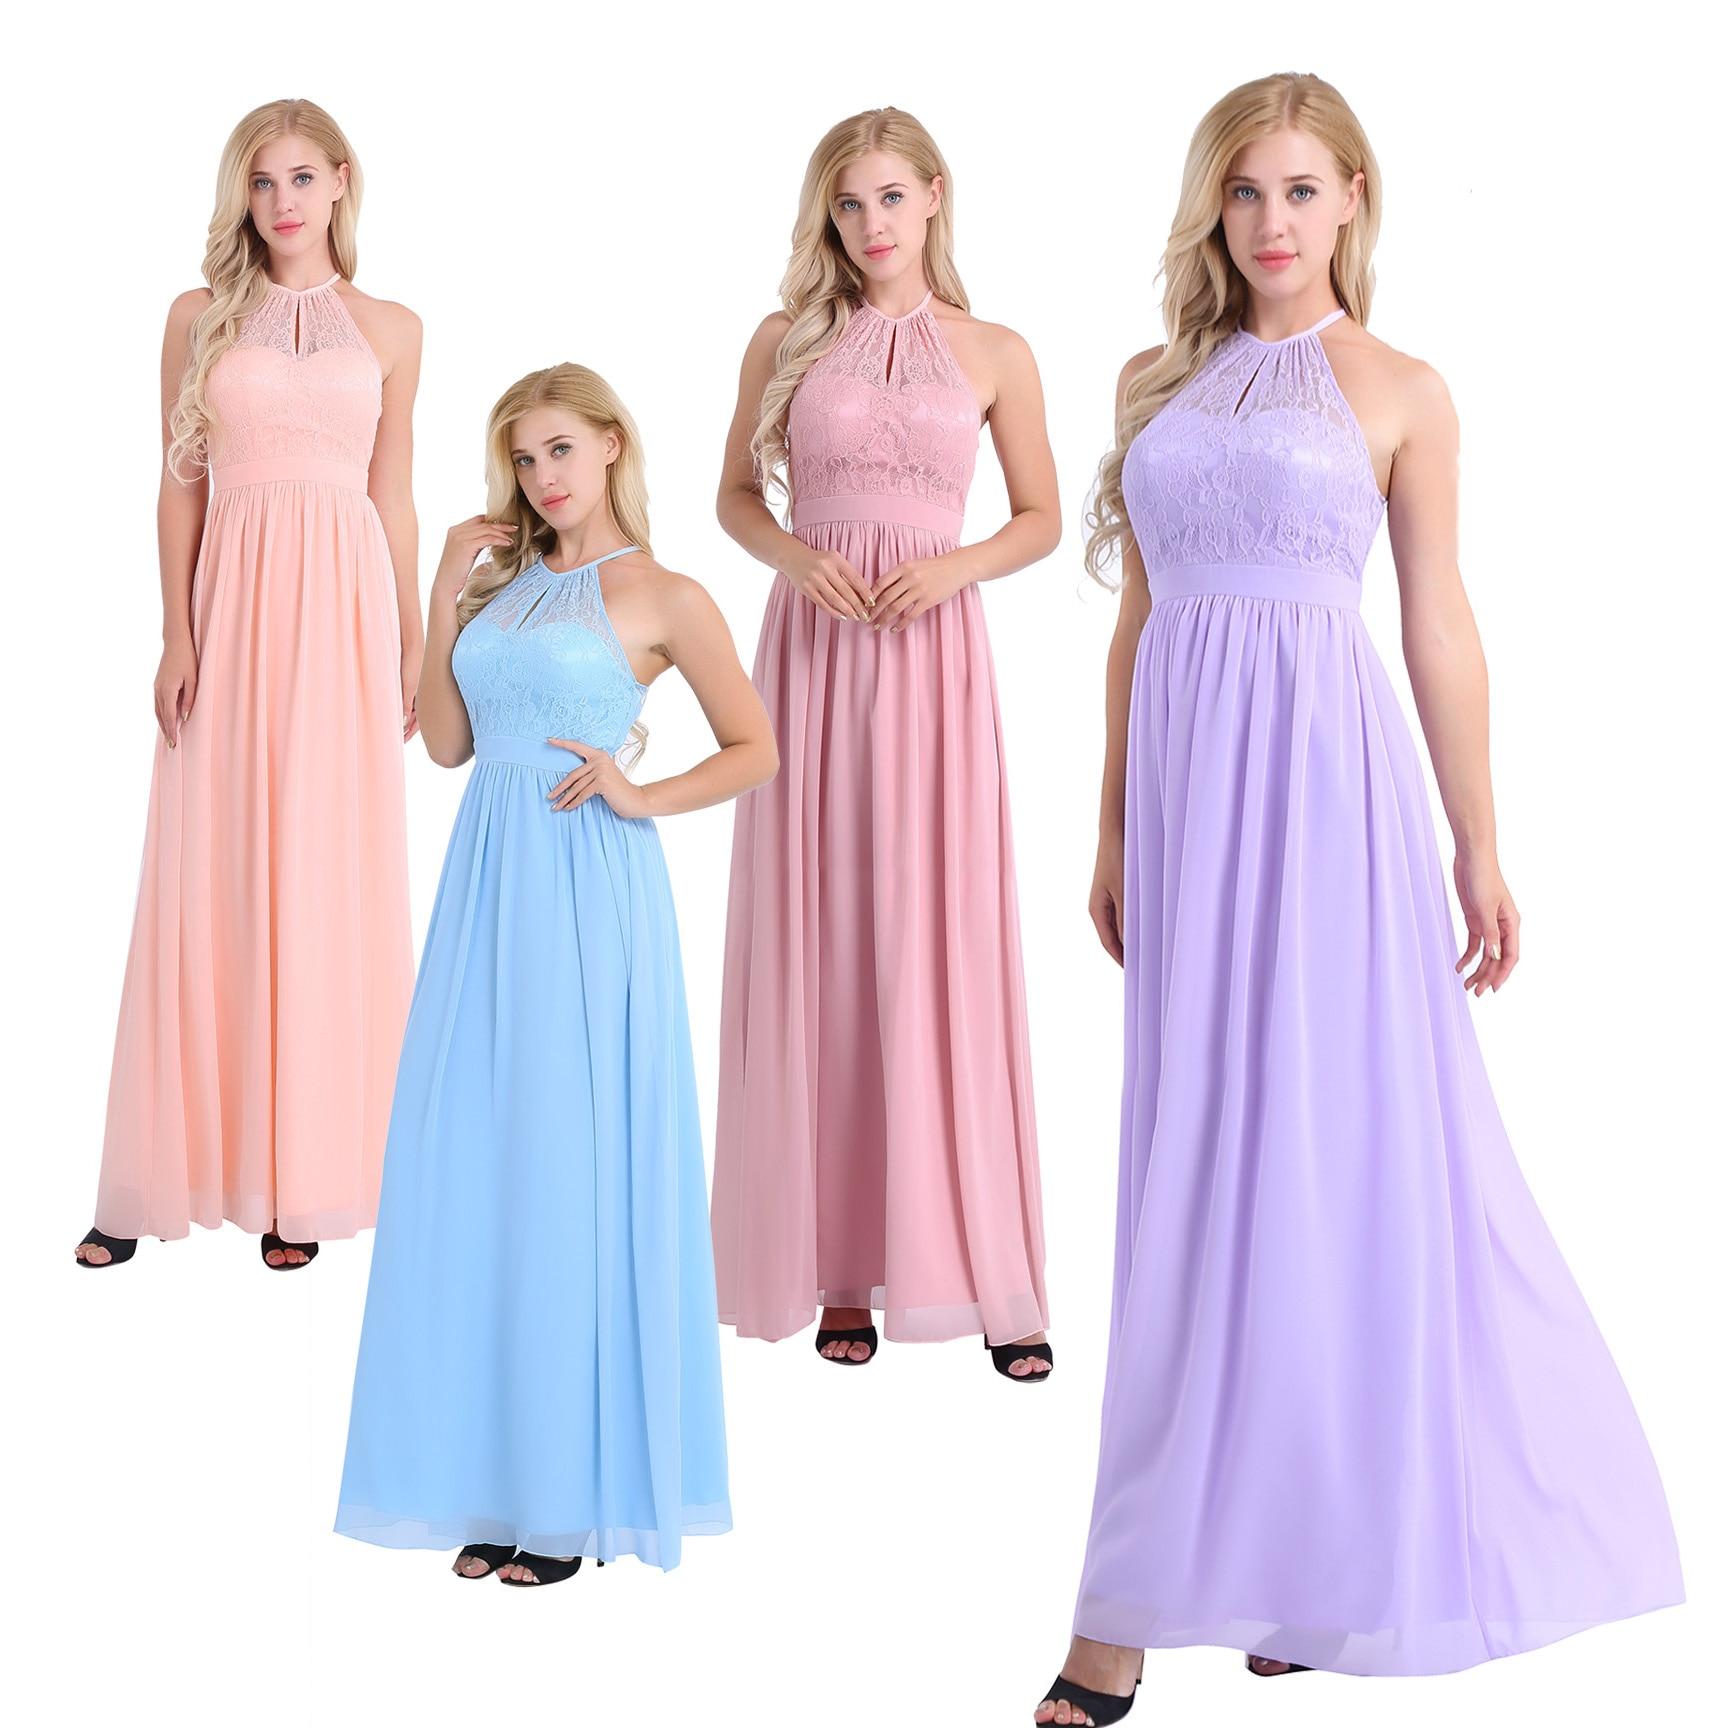 Image 2 - Women Ladies Neckline Halter Lace Floral Sleeveless Chiffon Dress Elegant Birthday Party Weeding Prom Gown First Communion Dresschiffon dressdress elegantelegant dress -